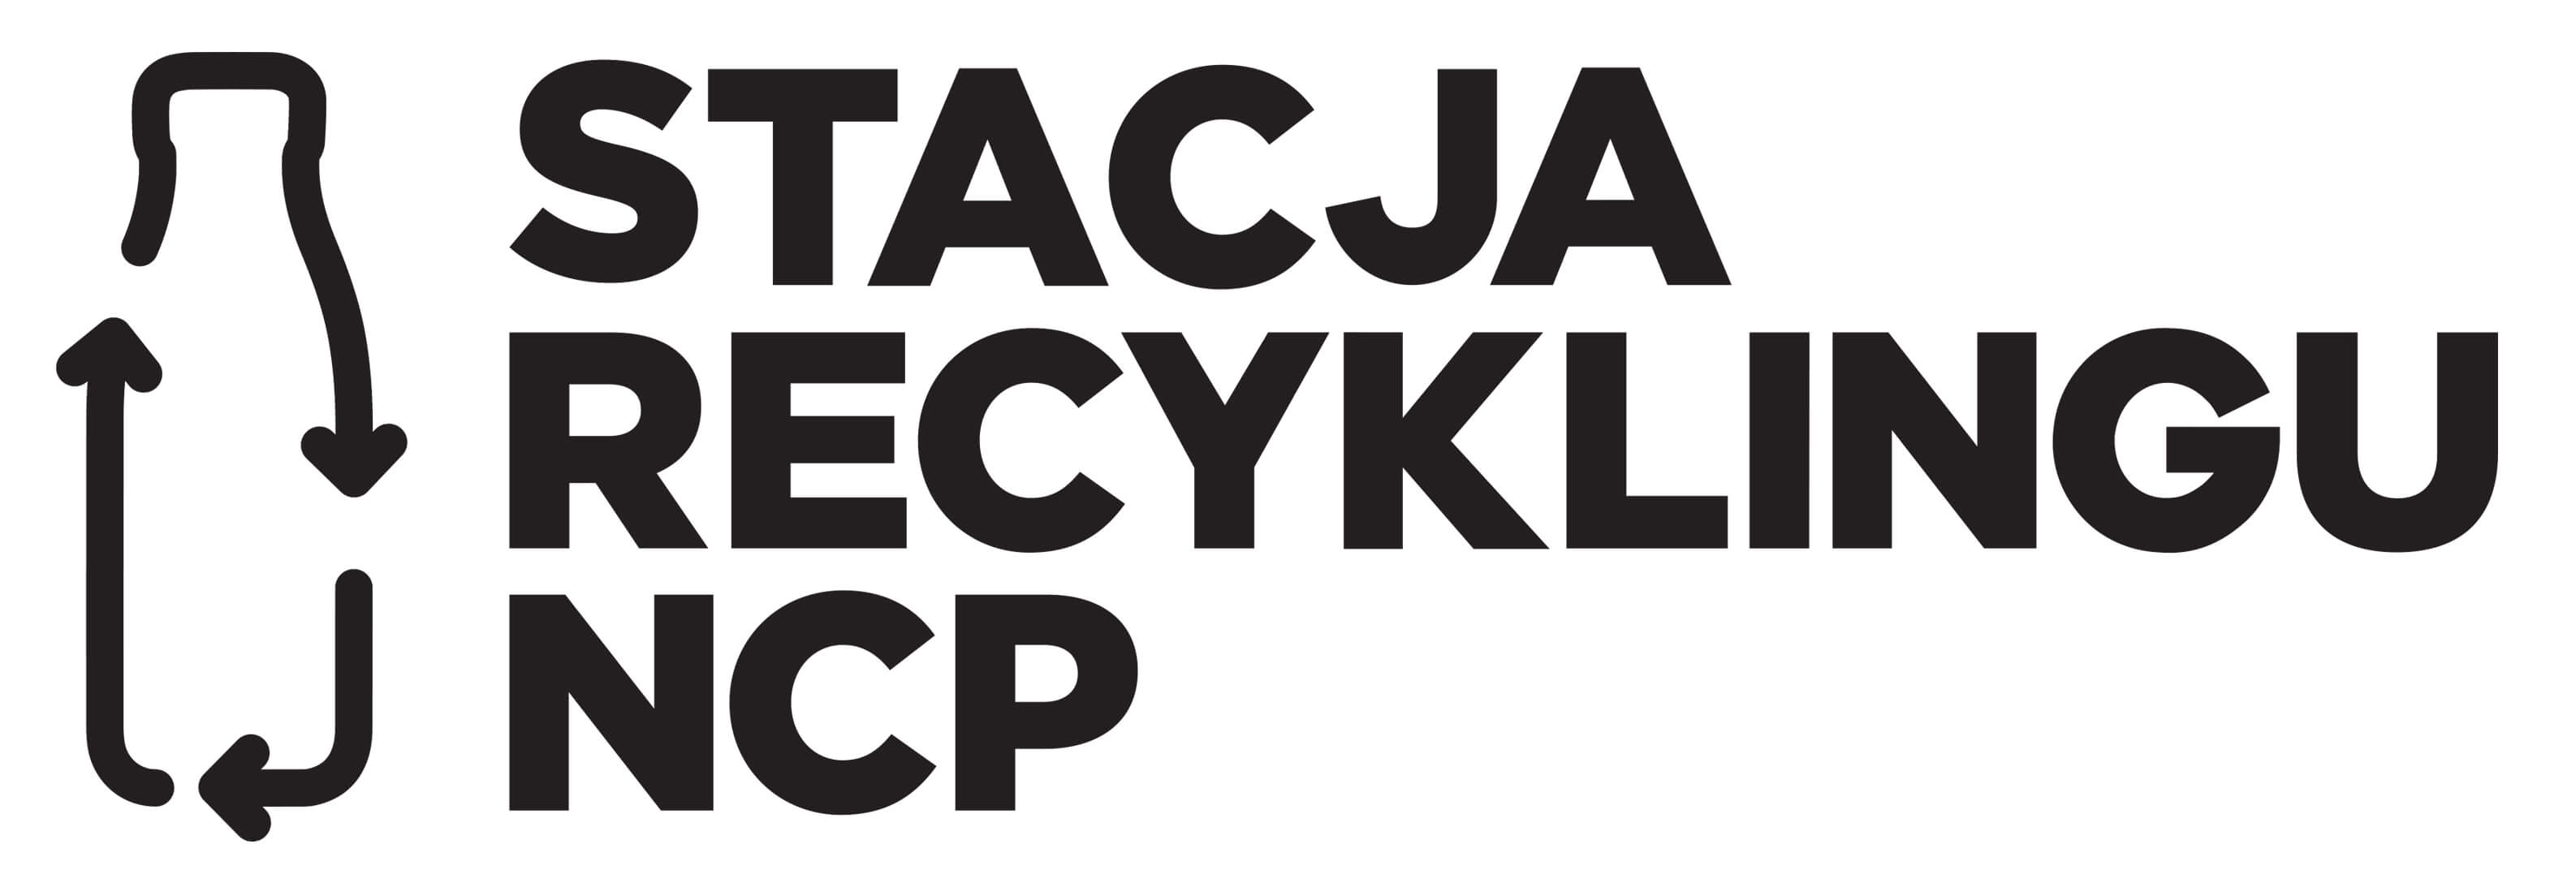 recykling-naturacoldpress